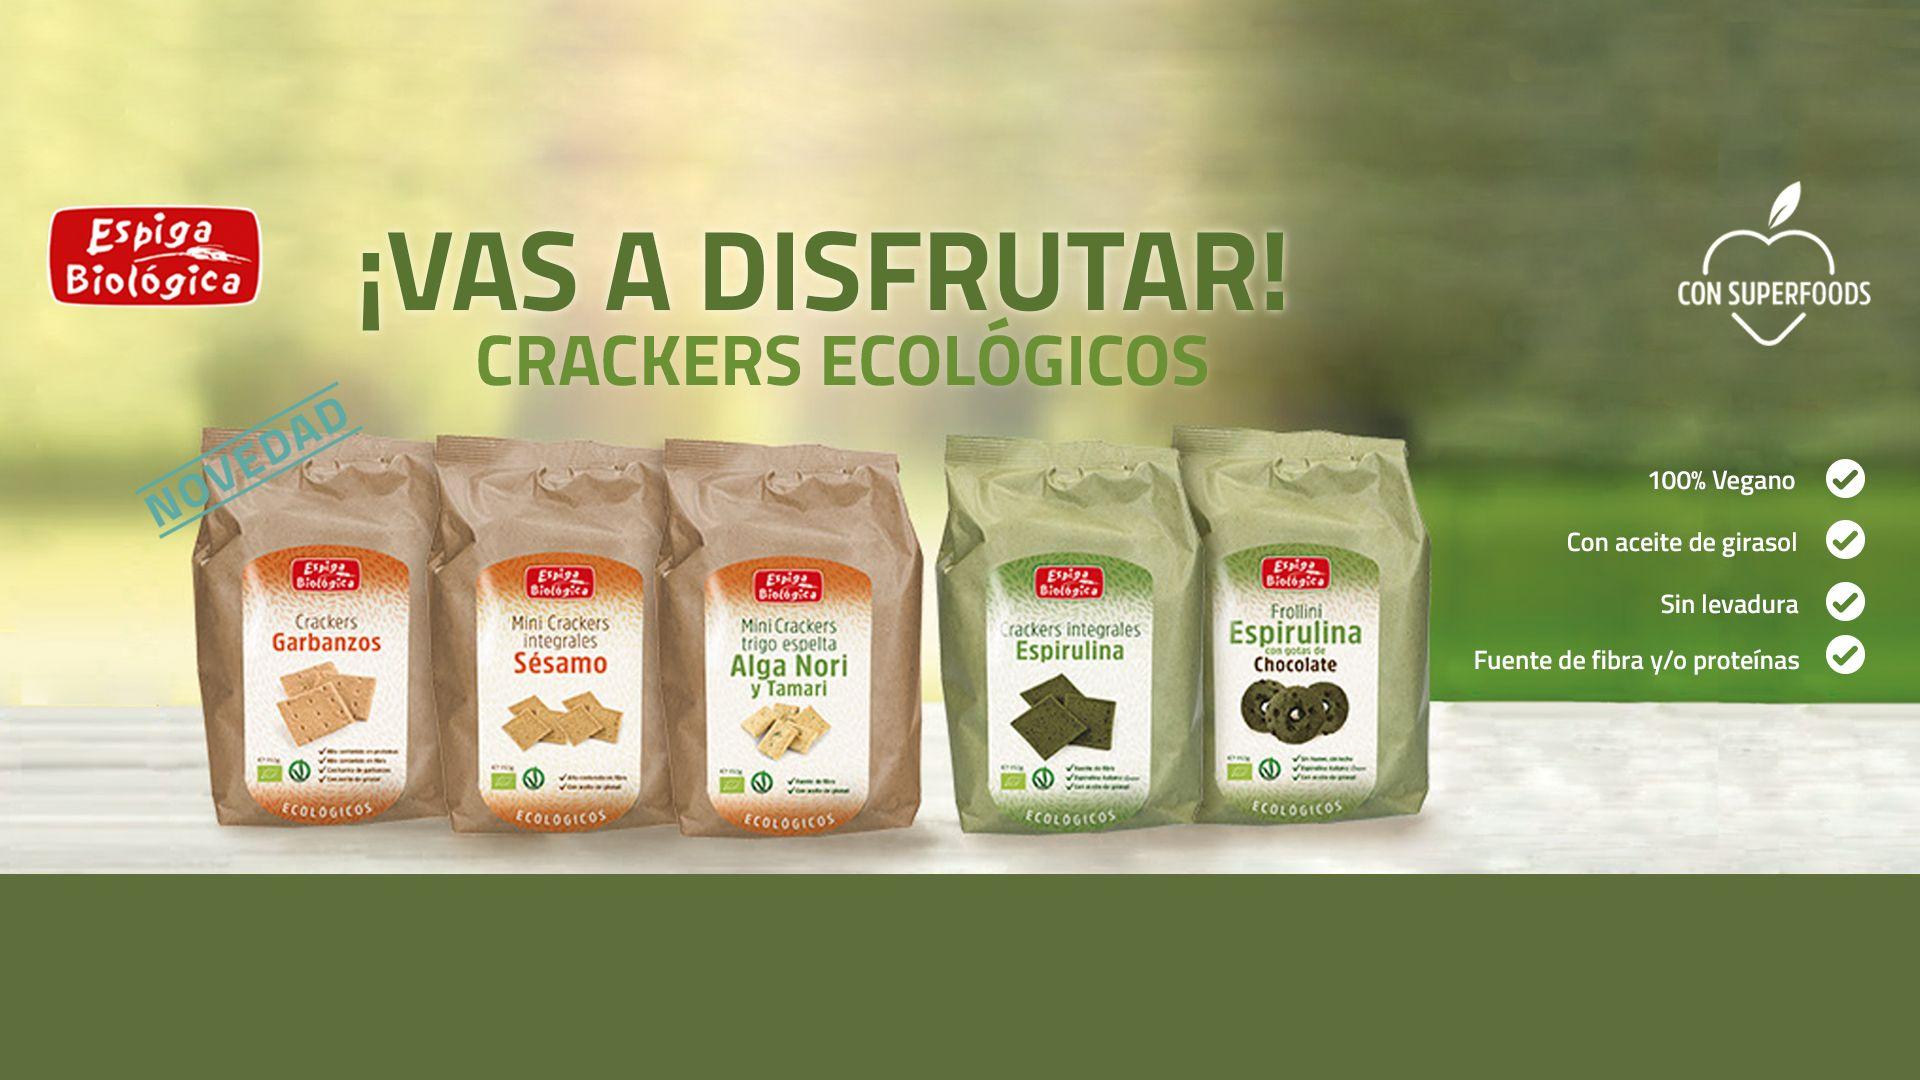 Crackers ecológicos con superfood 100% veganos